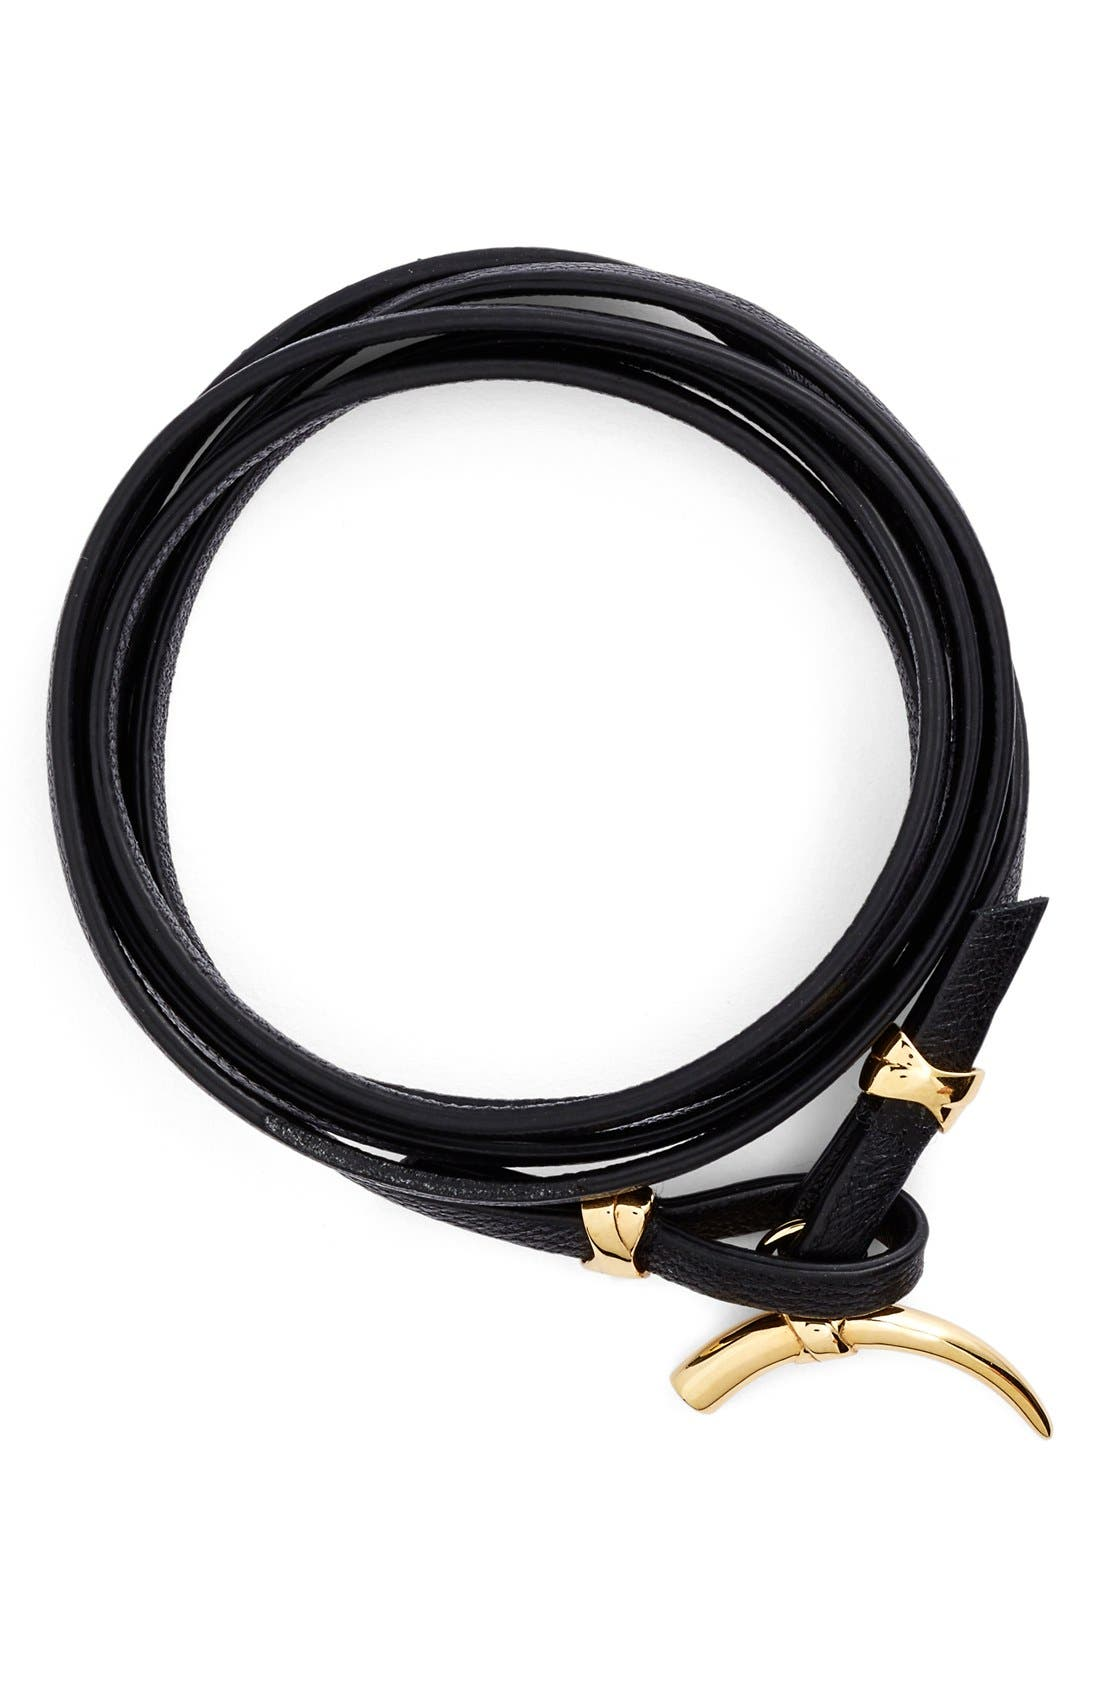 Alternate Image 1 Selected - Tory Burch Leather Wrap Bracelet